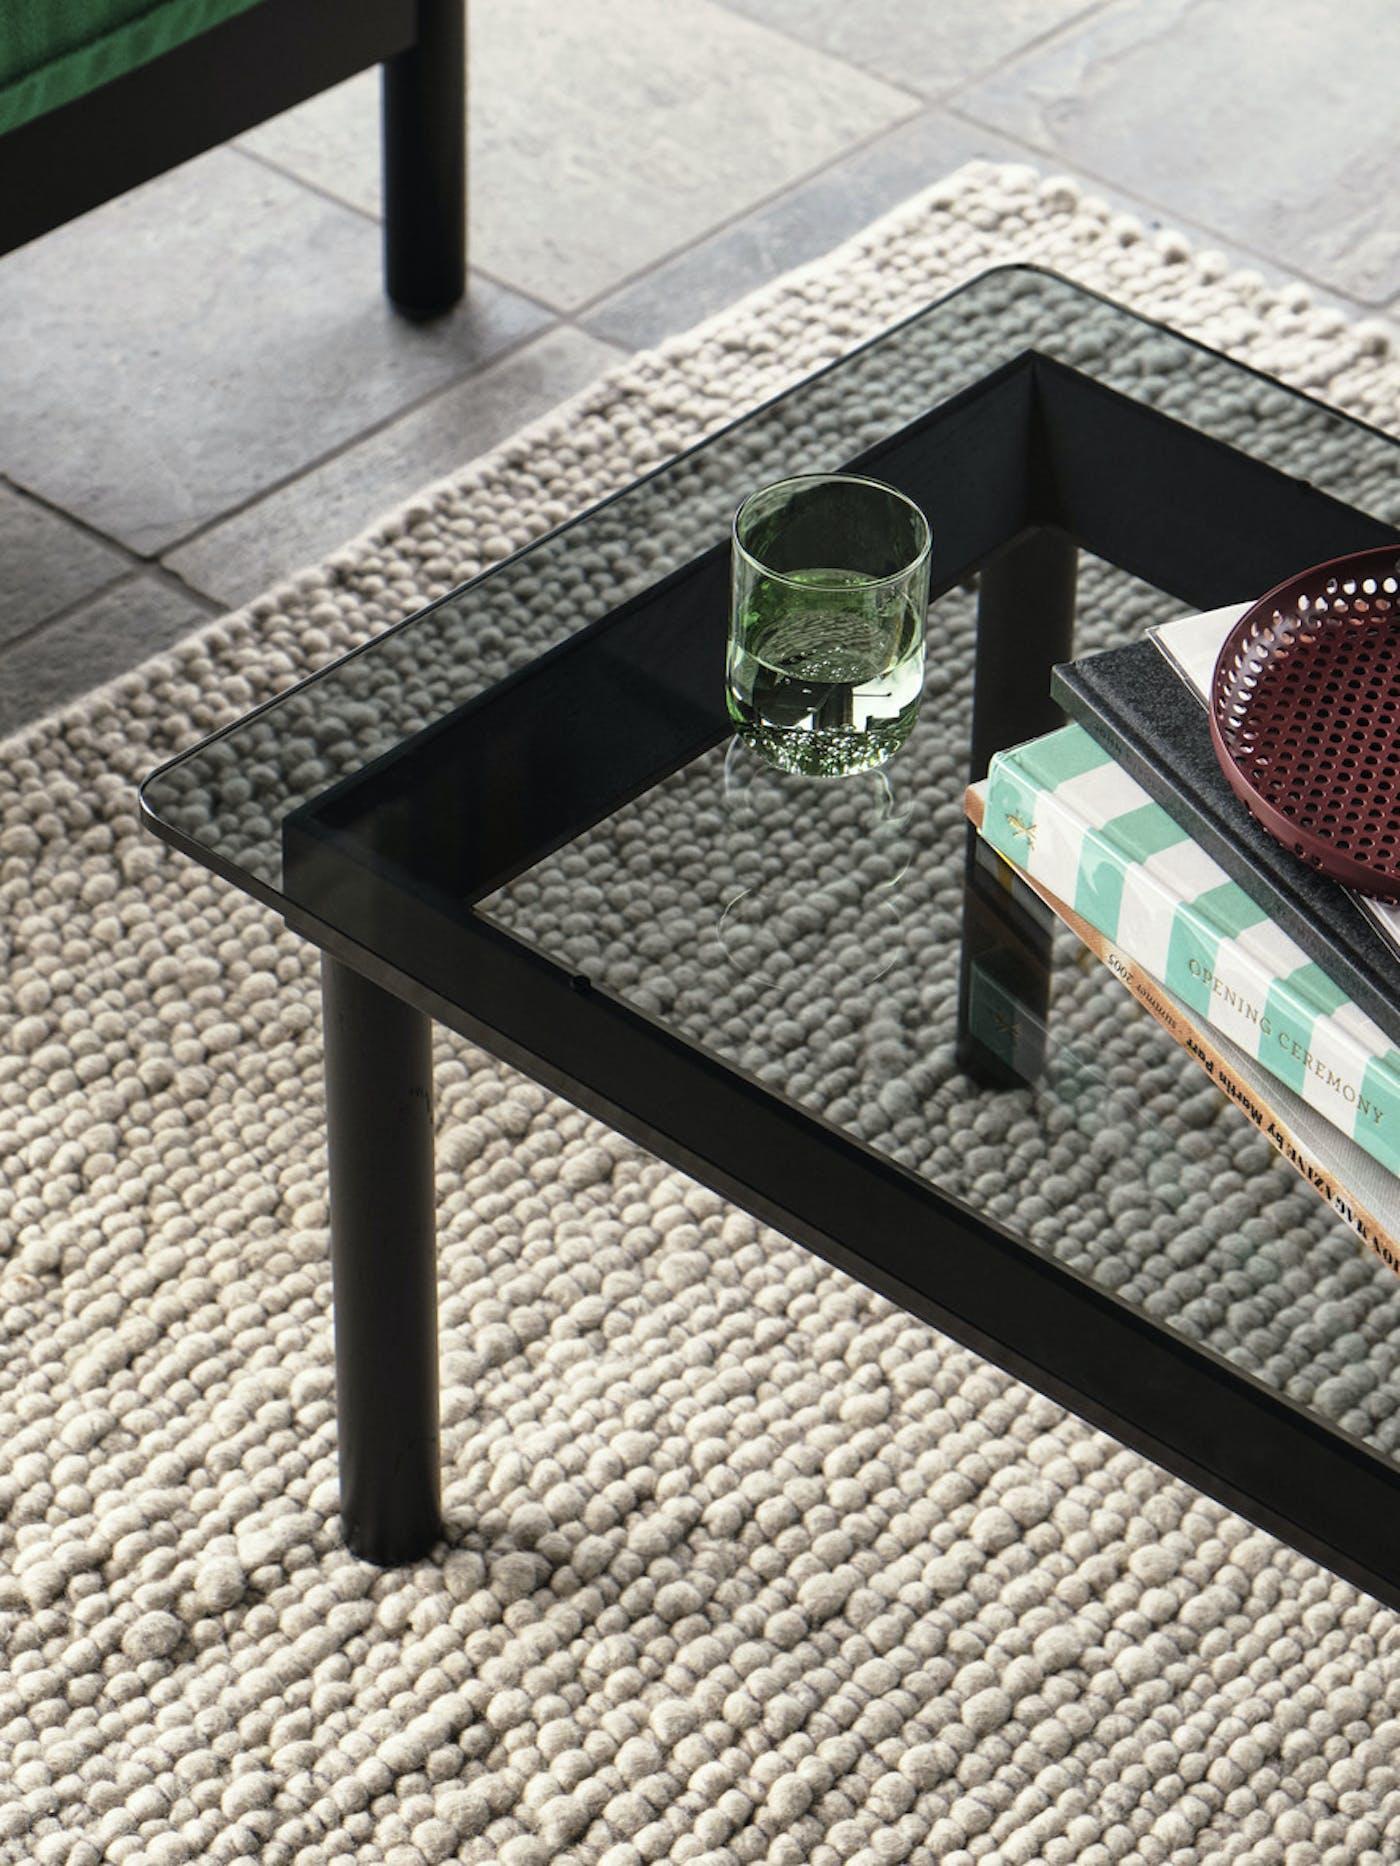 Kofi 140x50 grey tinted glass tabletop black wb lacquer oak frame Peas Random soft grey Tint Tumbler green